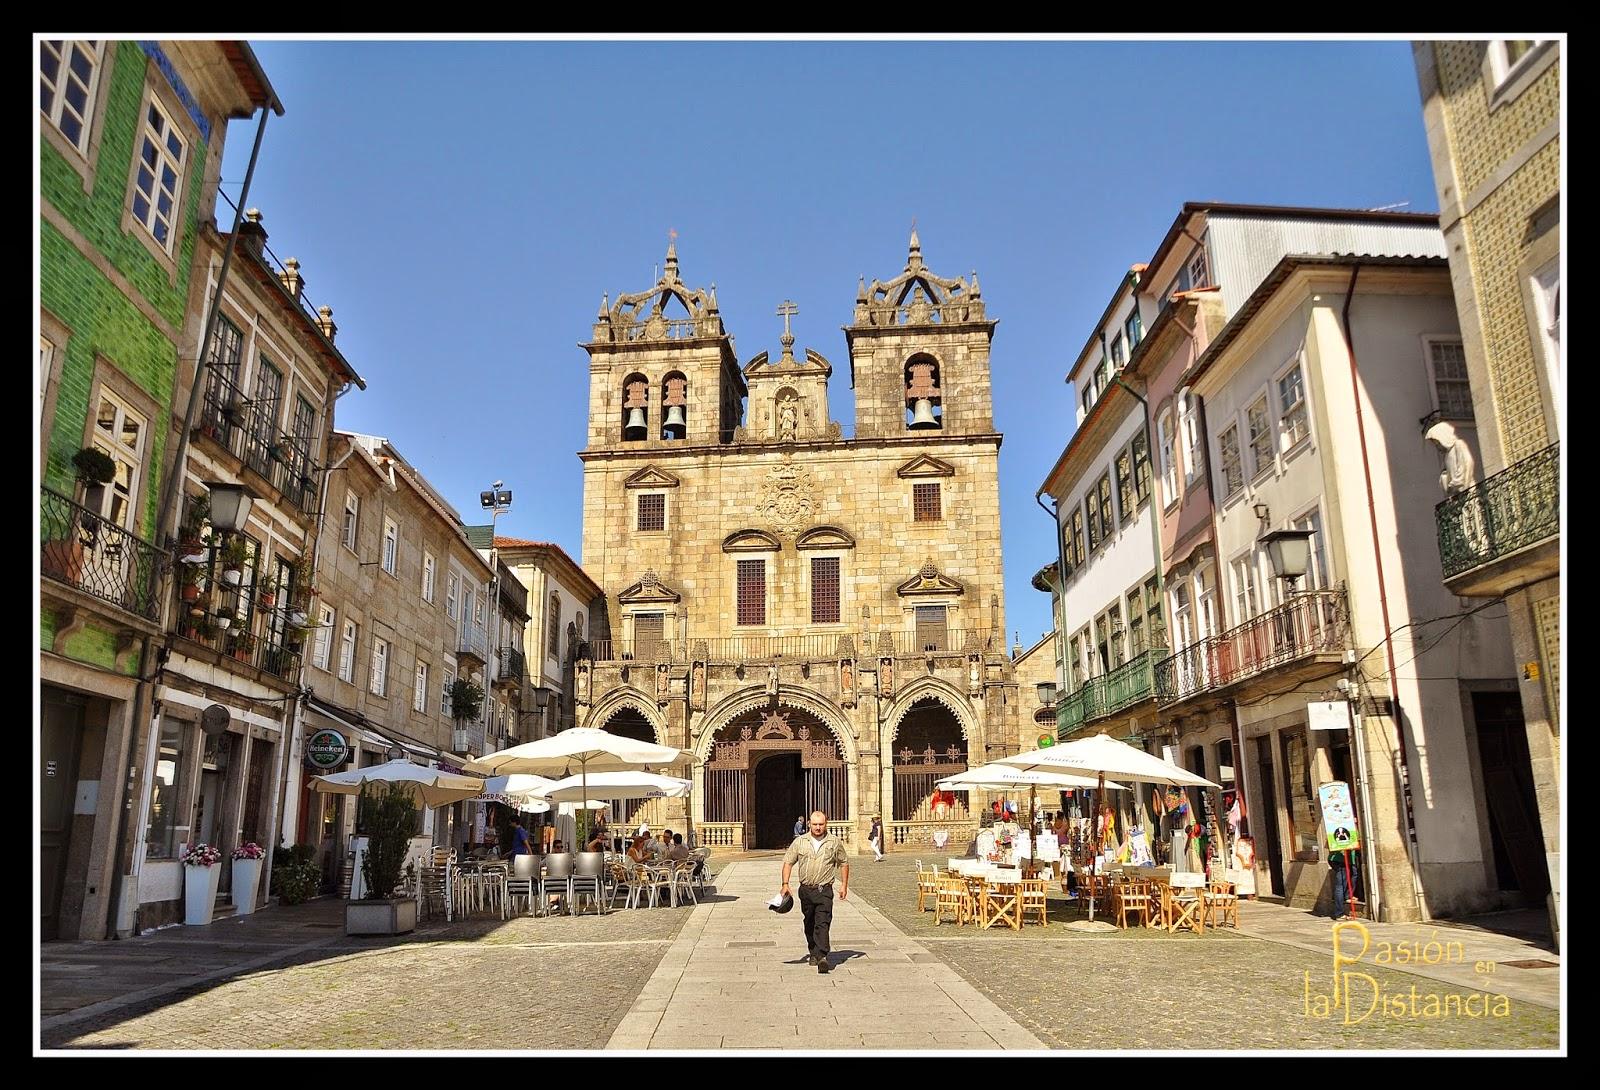 Fachada_Sé_Catedral-Braga